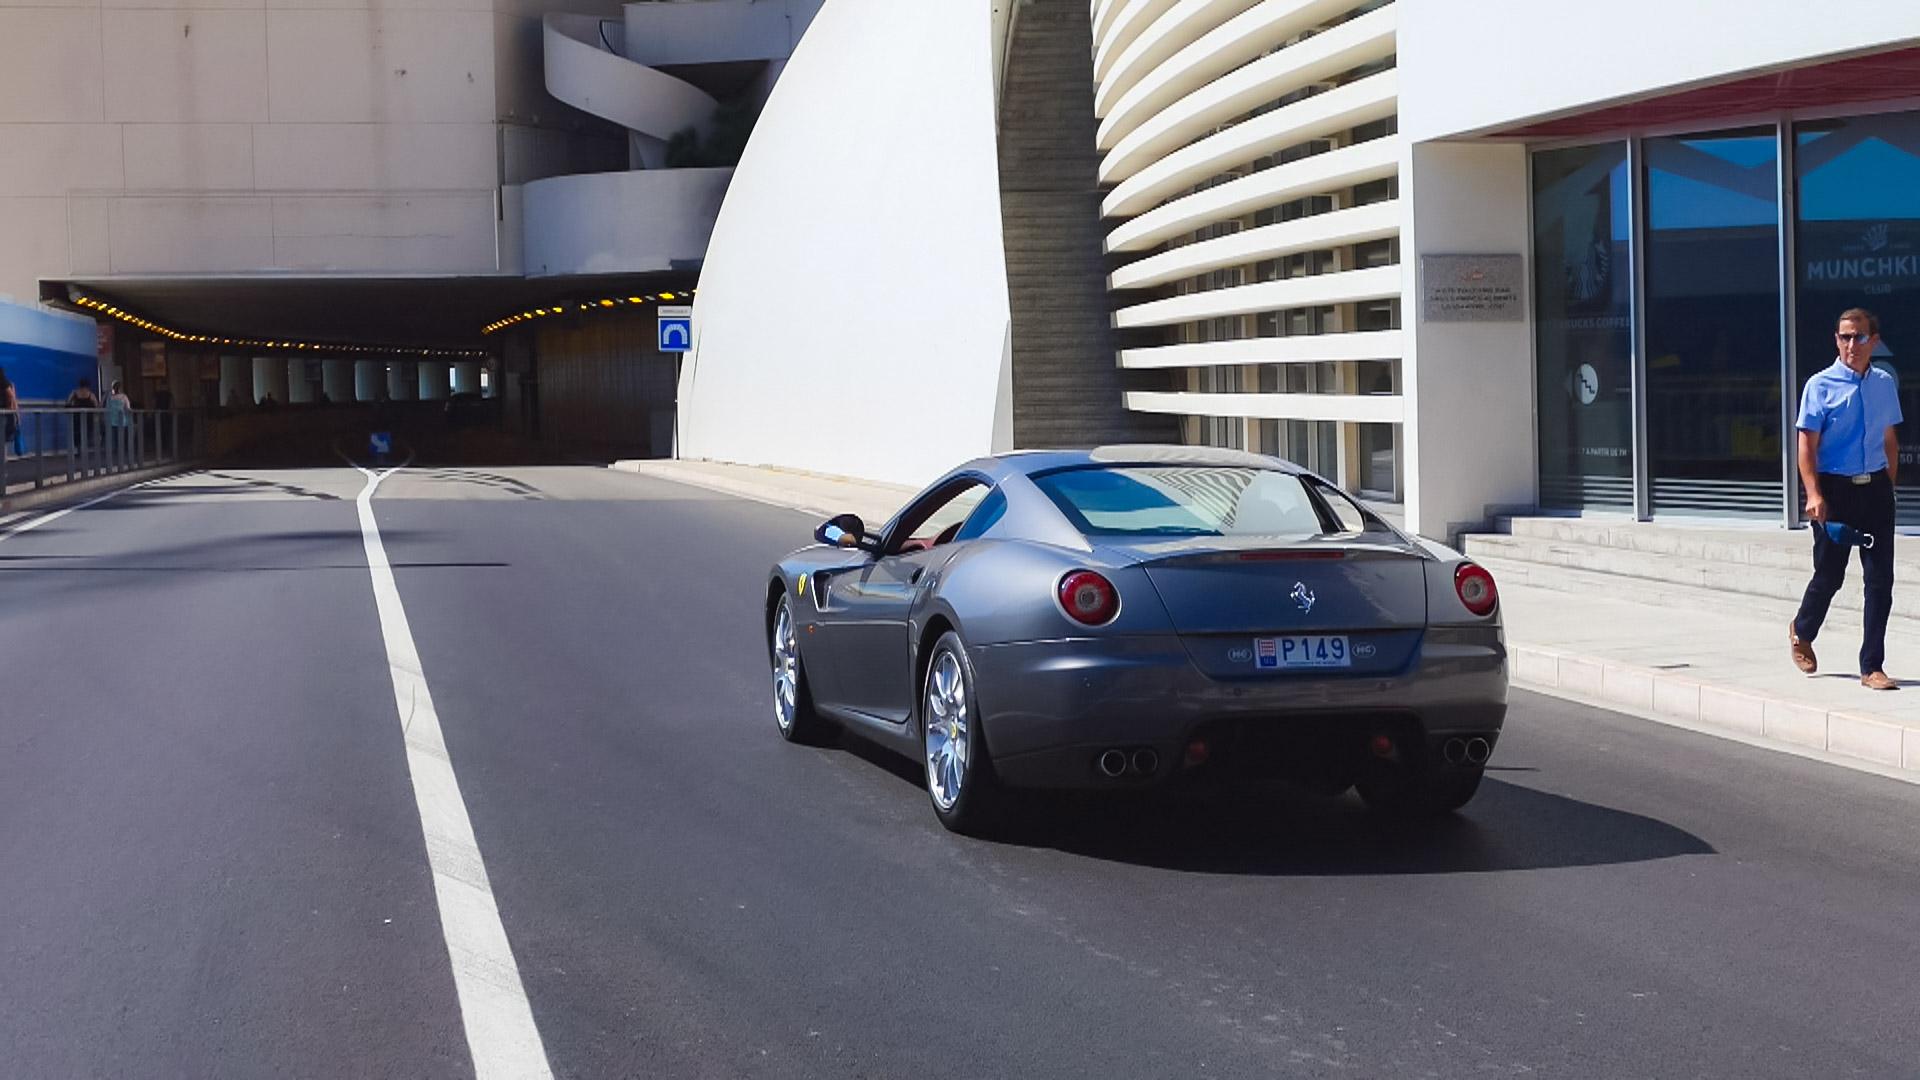 Ferrari 599 GTB - P149 (MC)